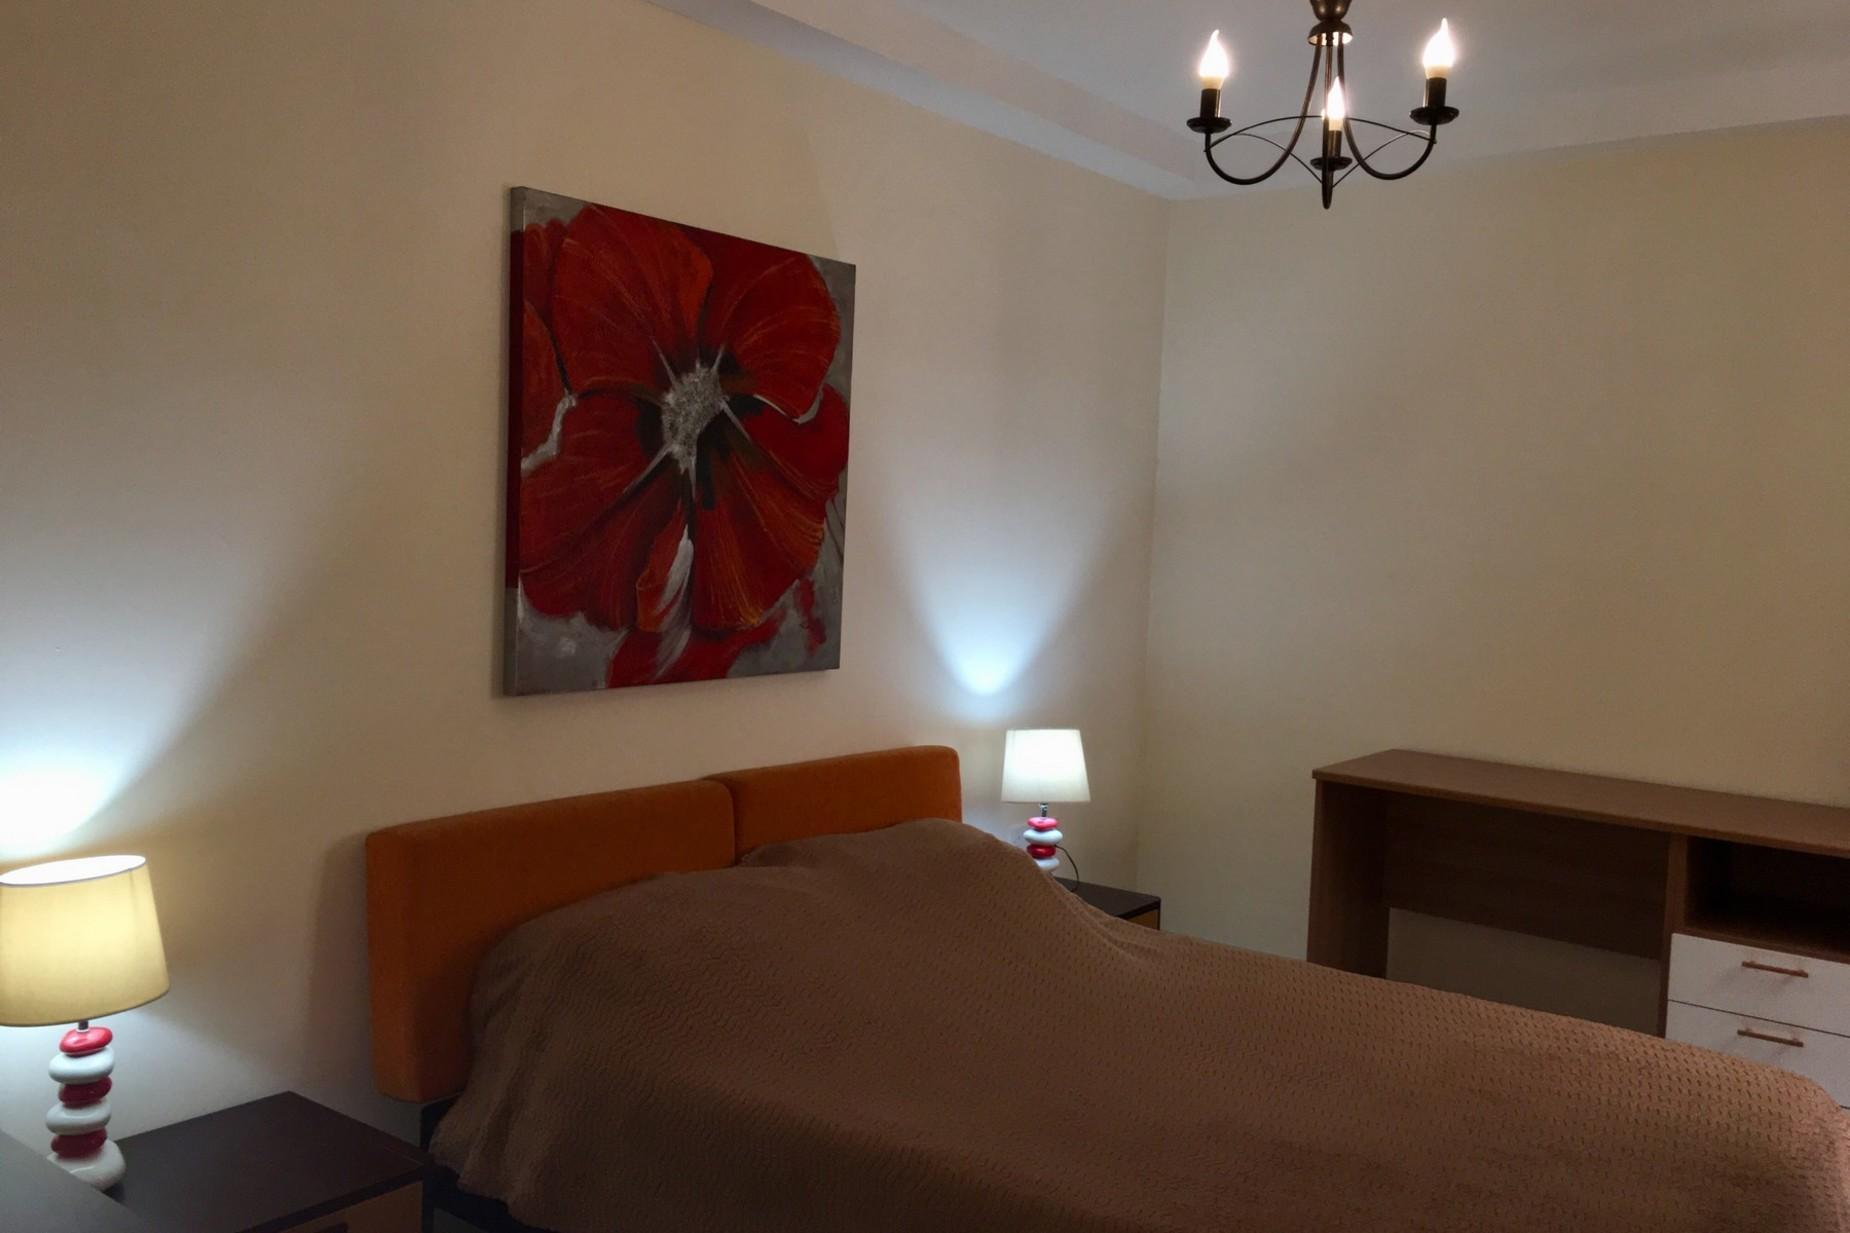 3 bed Apartment For Sale in Vittoriosa, Vittoriosa - thumb 5